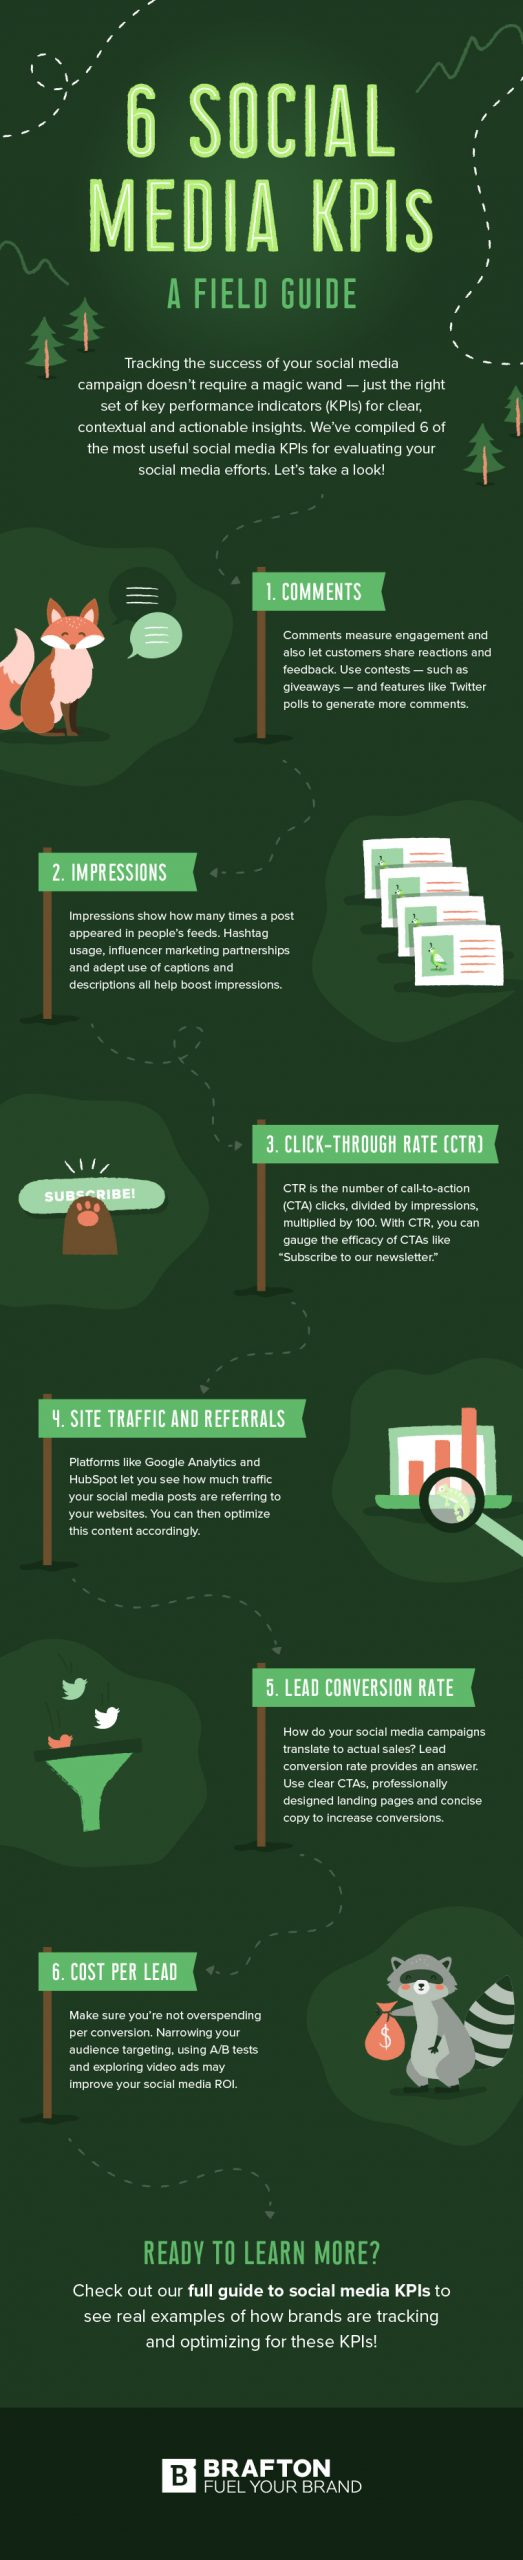 social media kpis brafton infographic